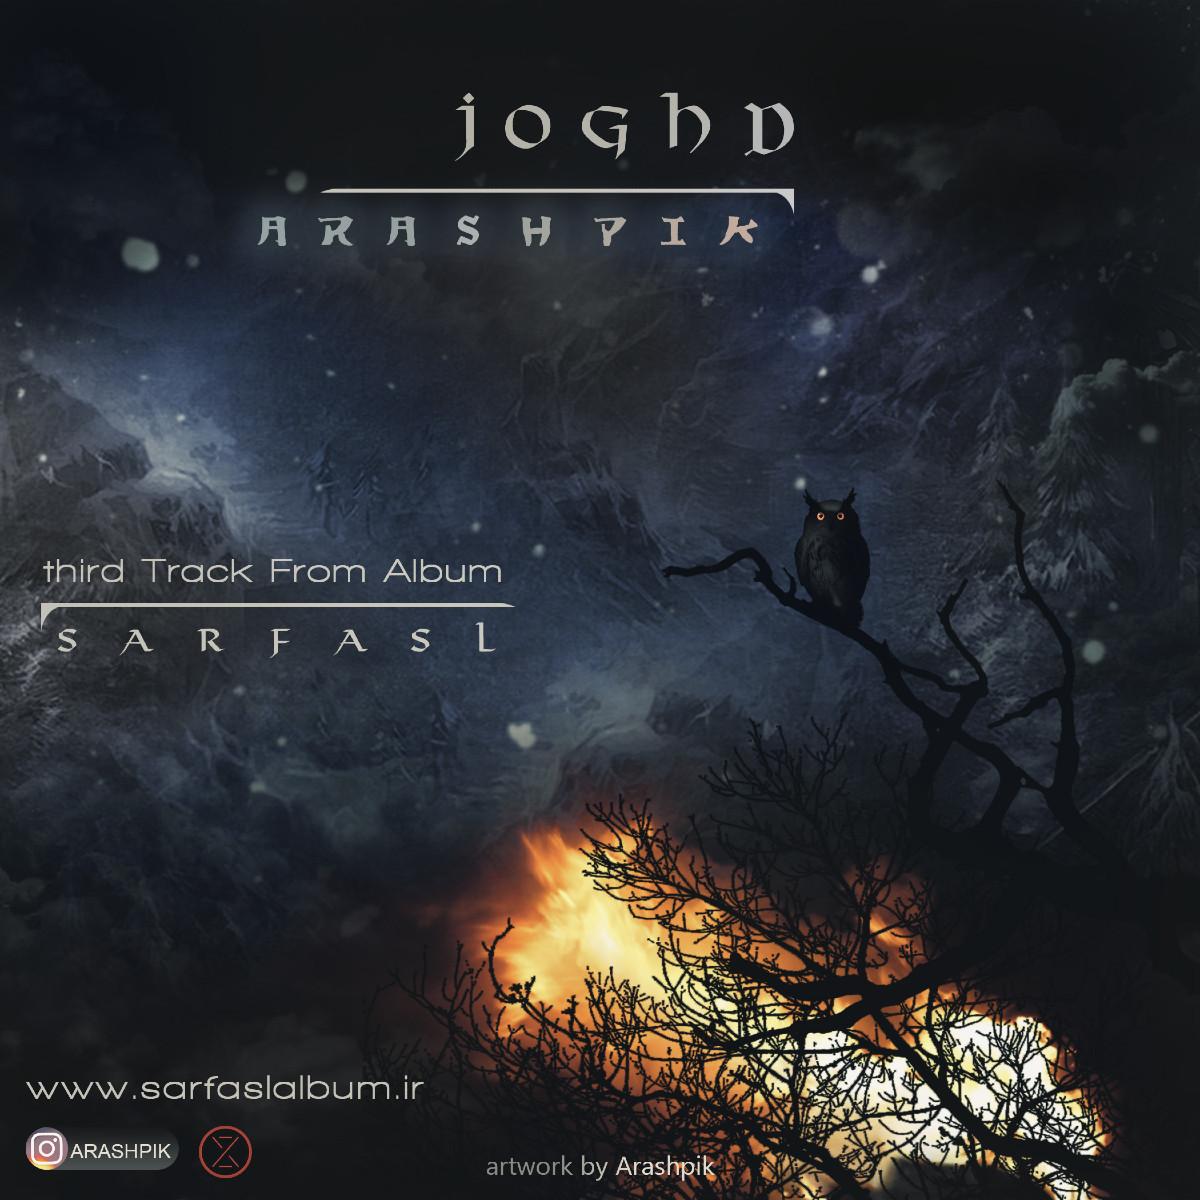 Arashpik - Joghd